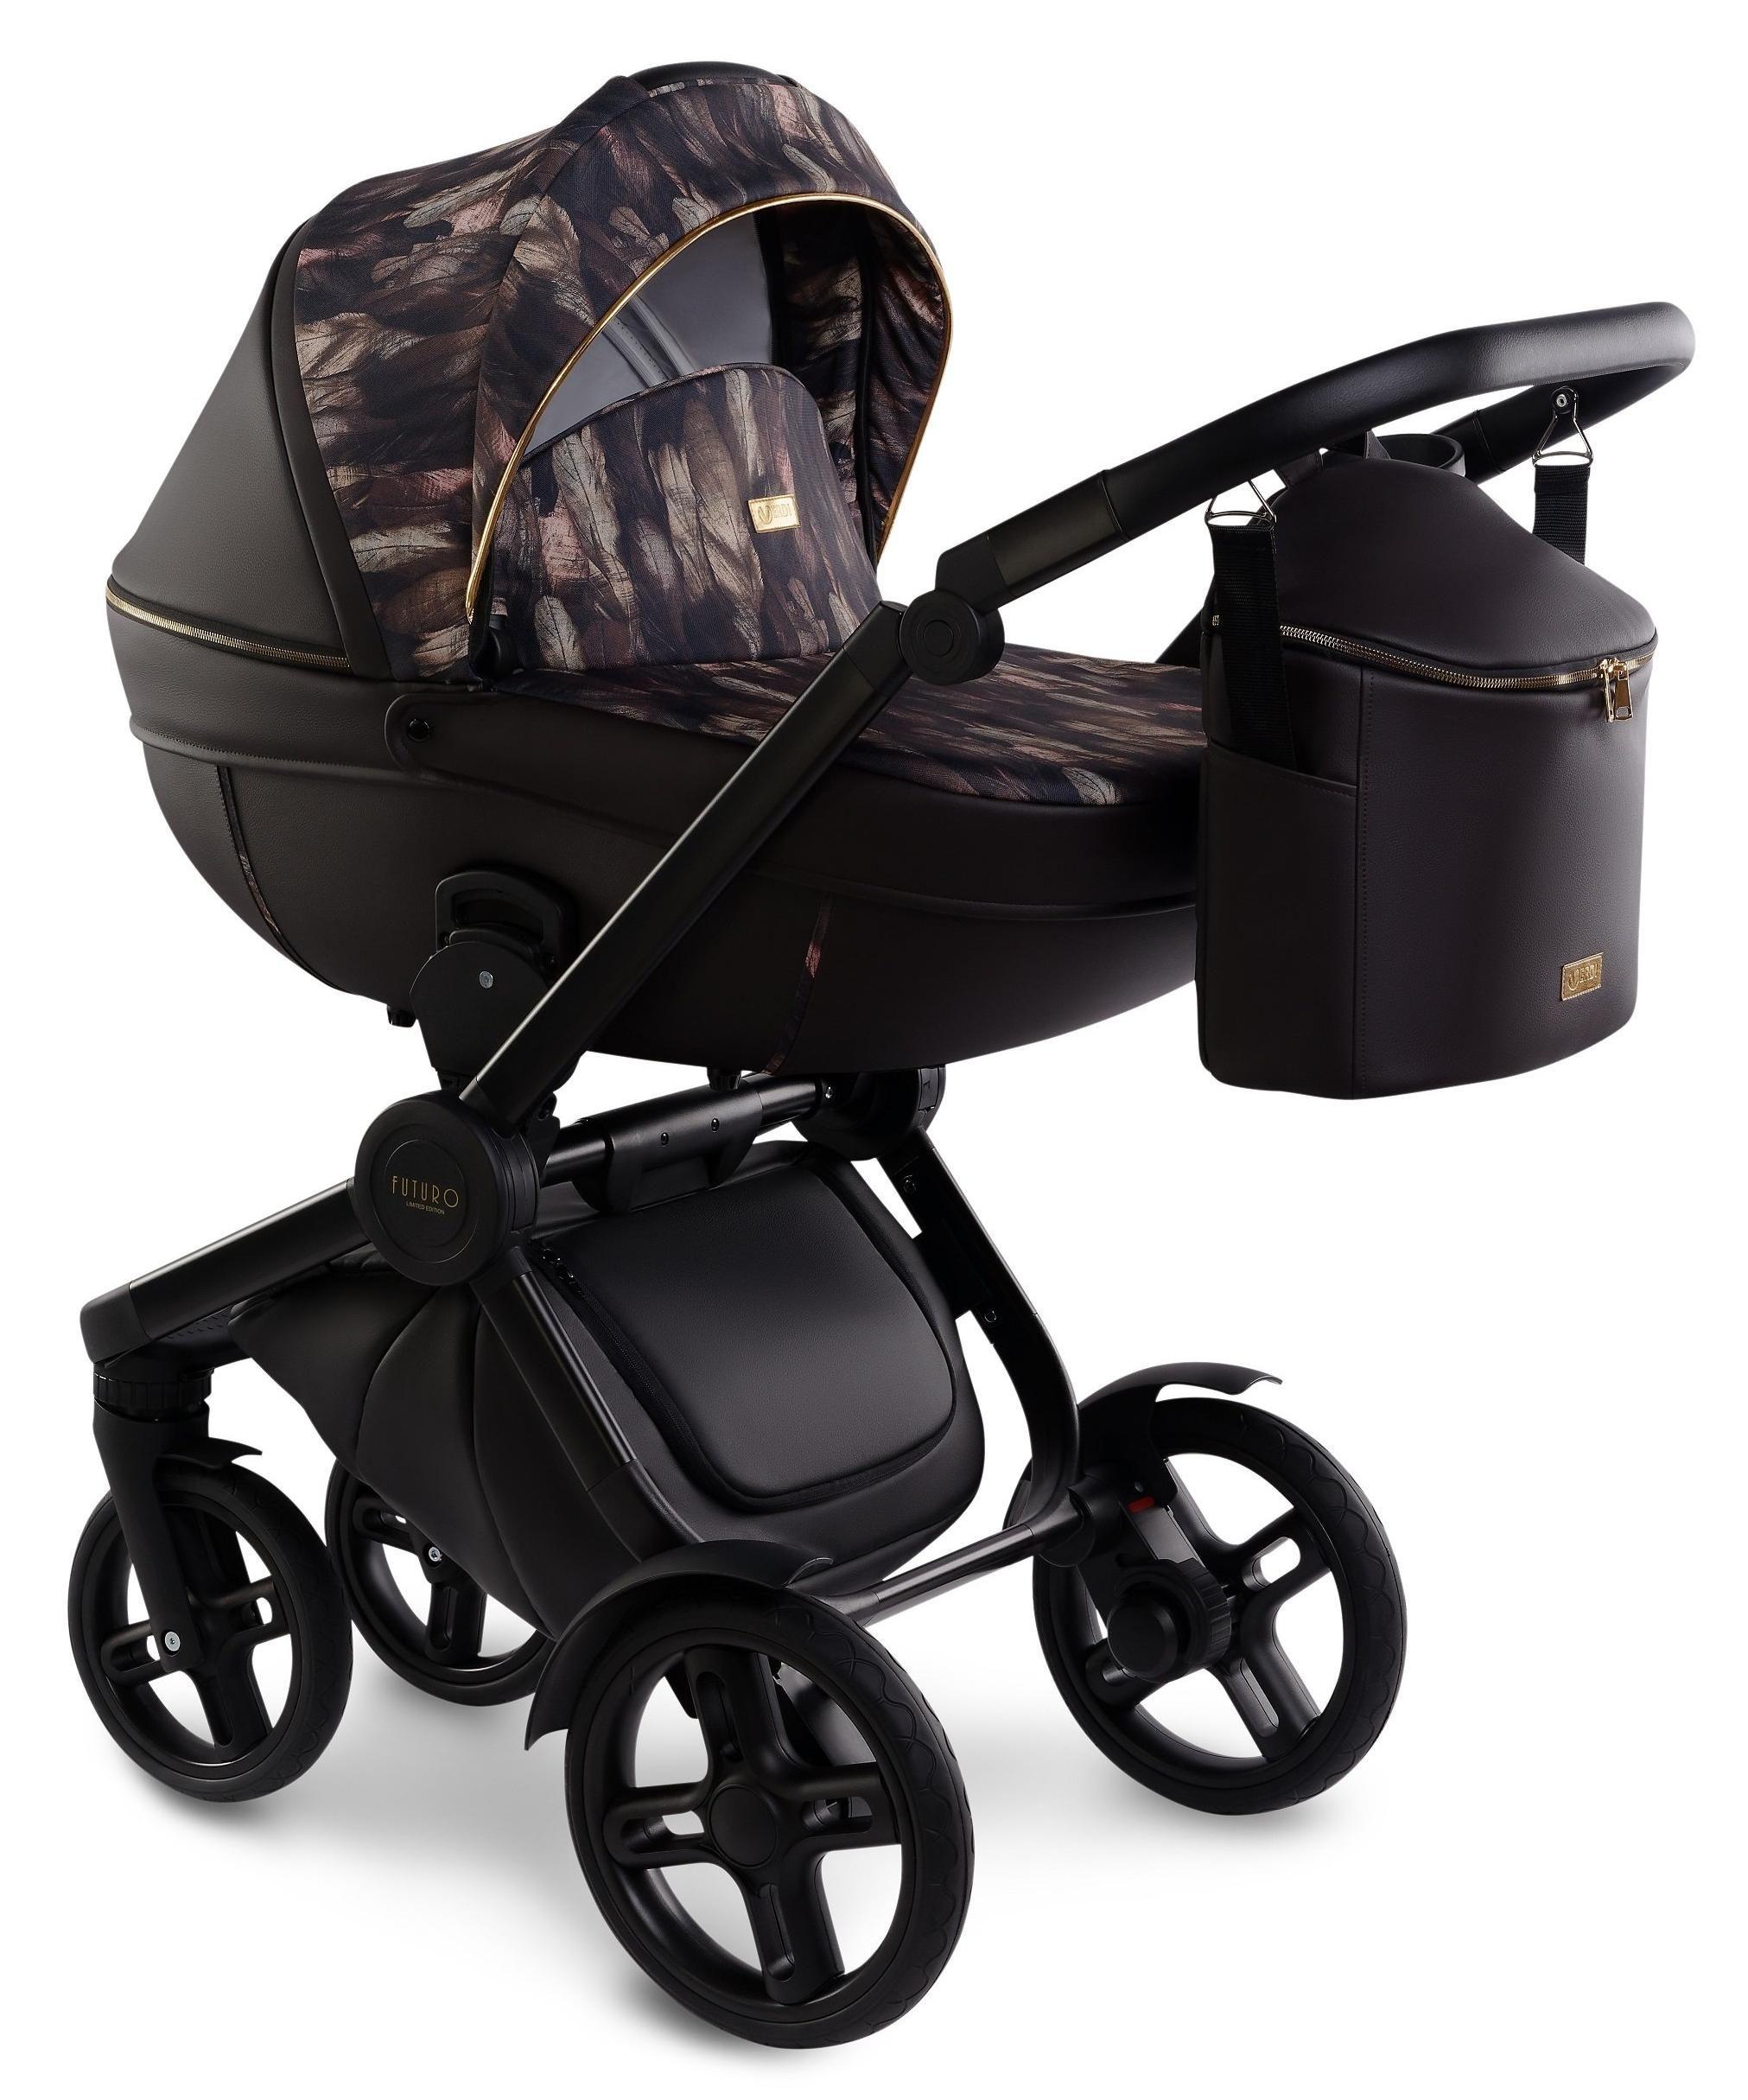 POLO Modern Line 3in1 Stroller, Baby strollers, Pram